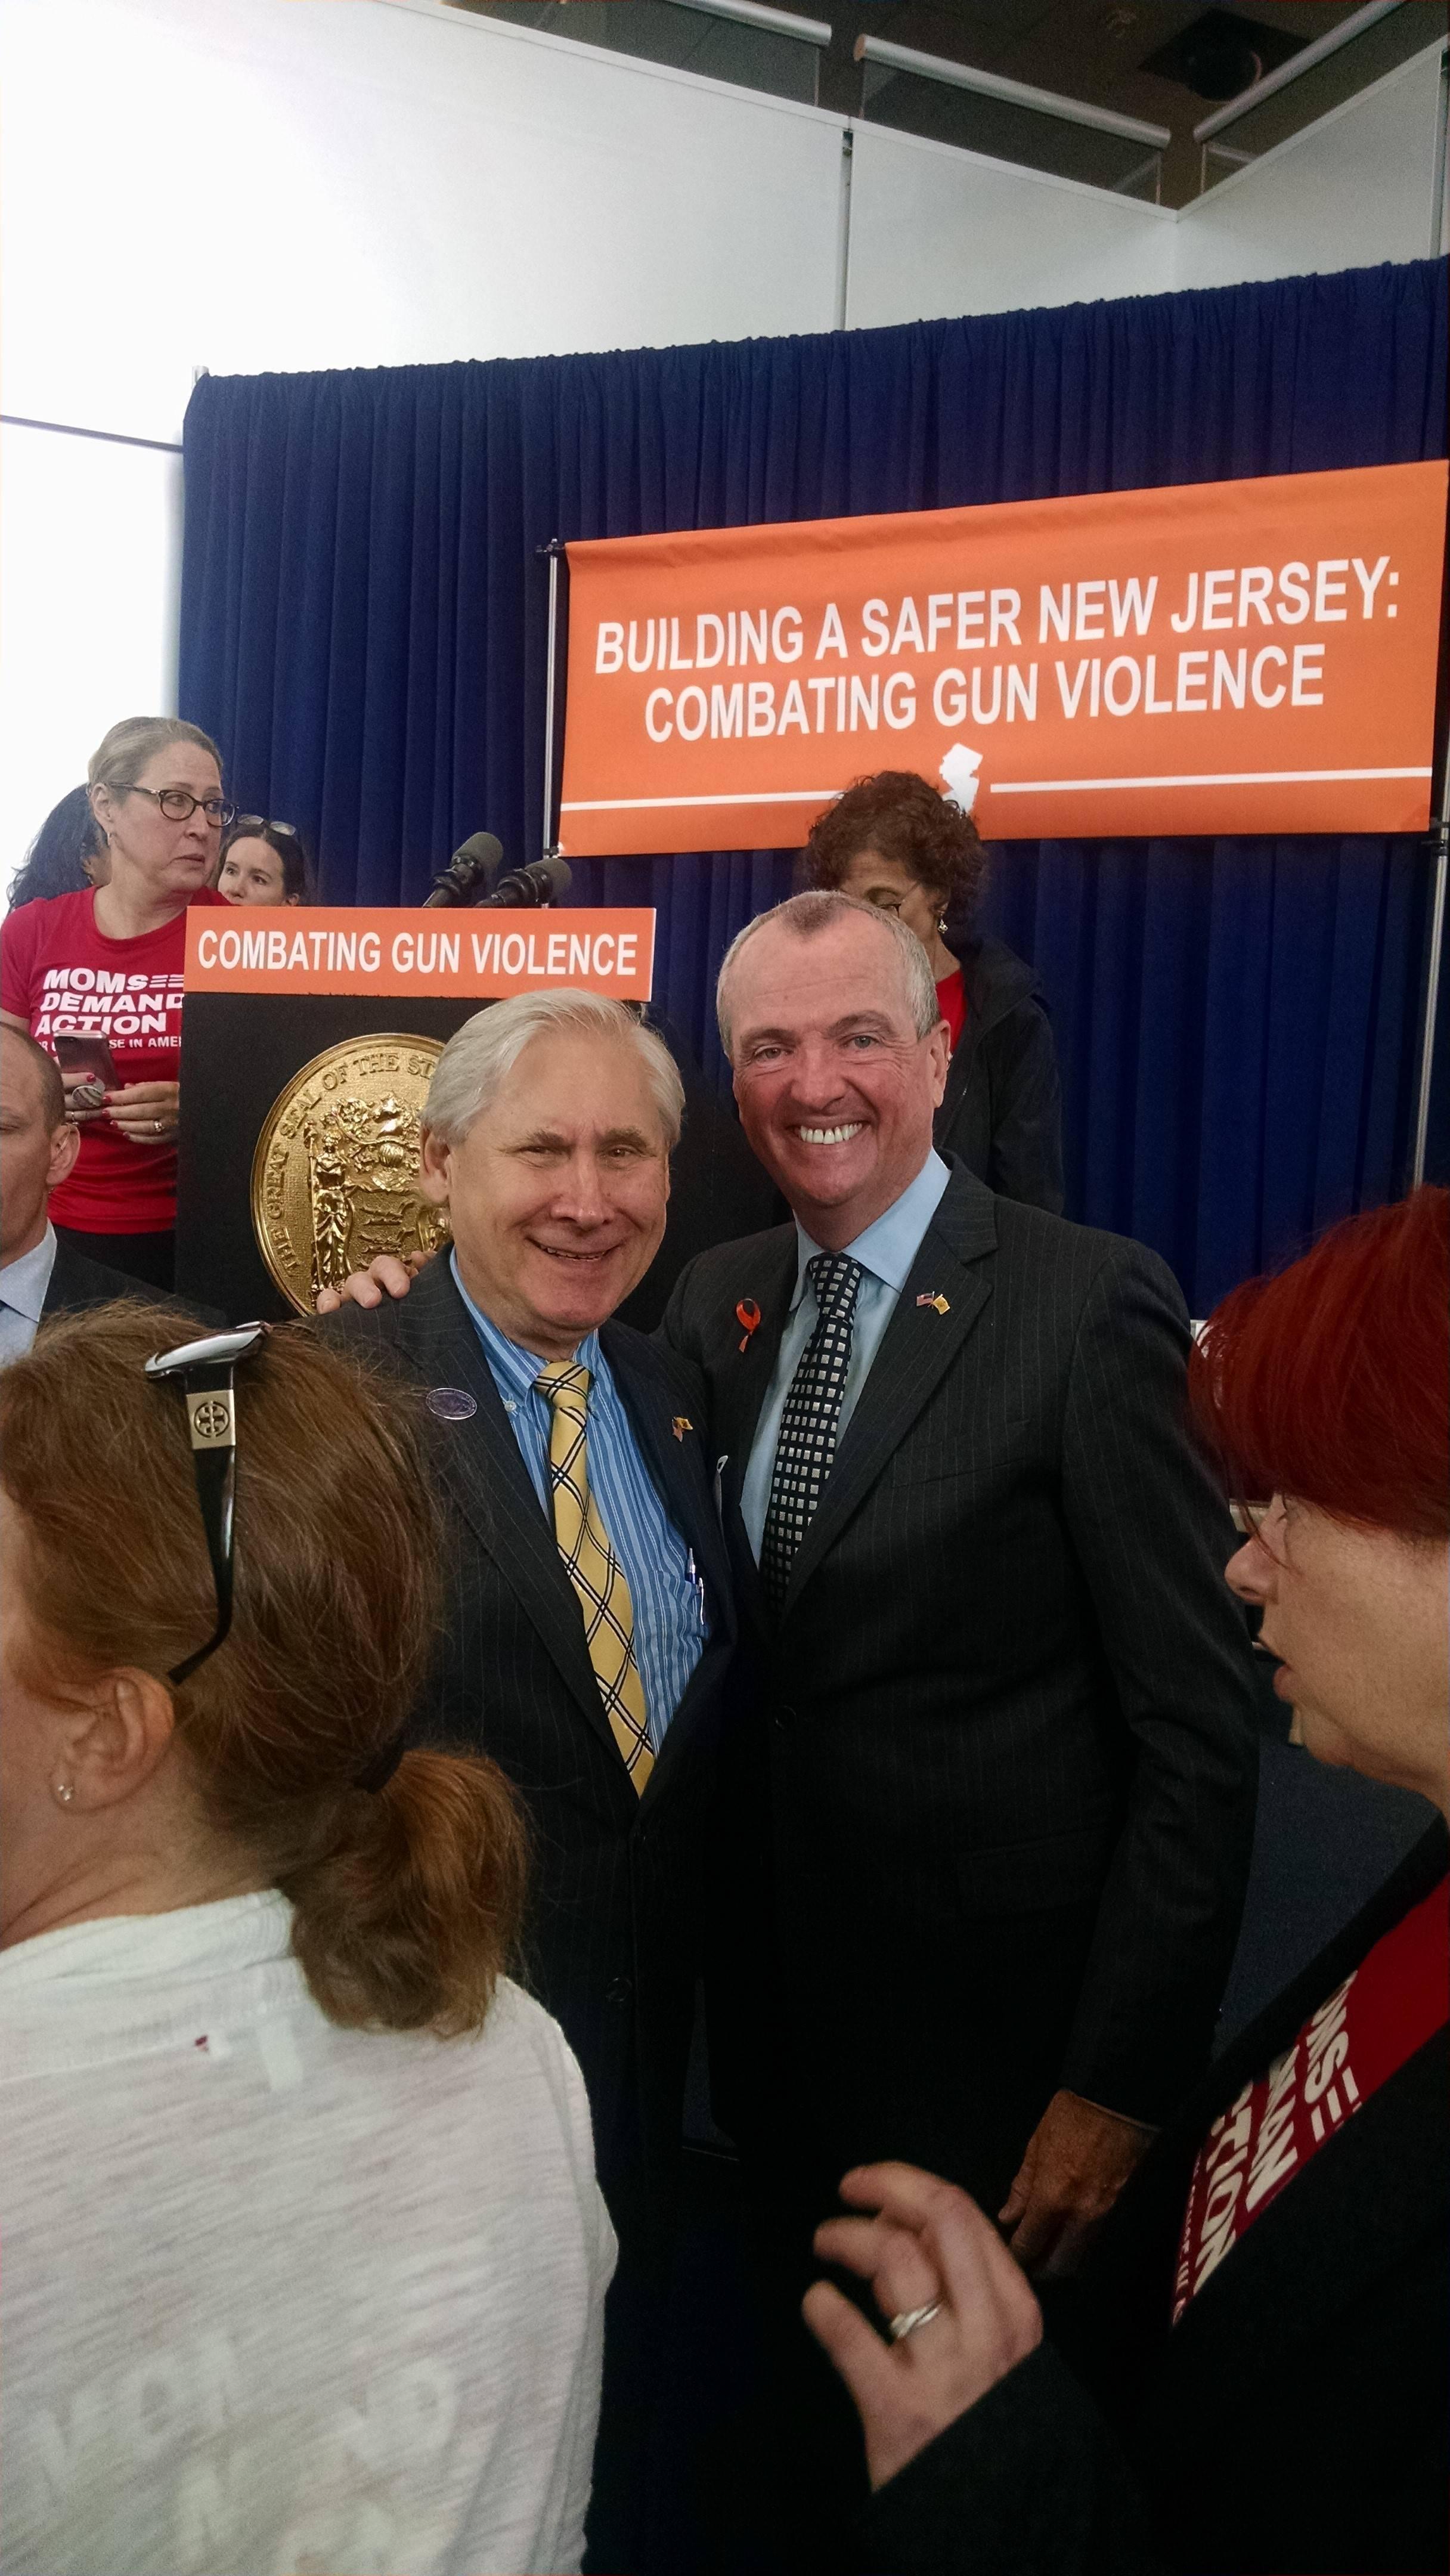 6f42287c44f5260dd3c3_Governor_Murphy_with_Mayor_Al_Smith.jpg